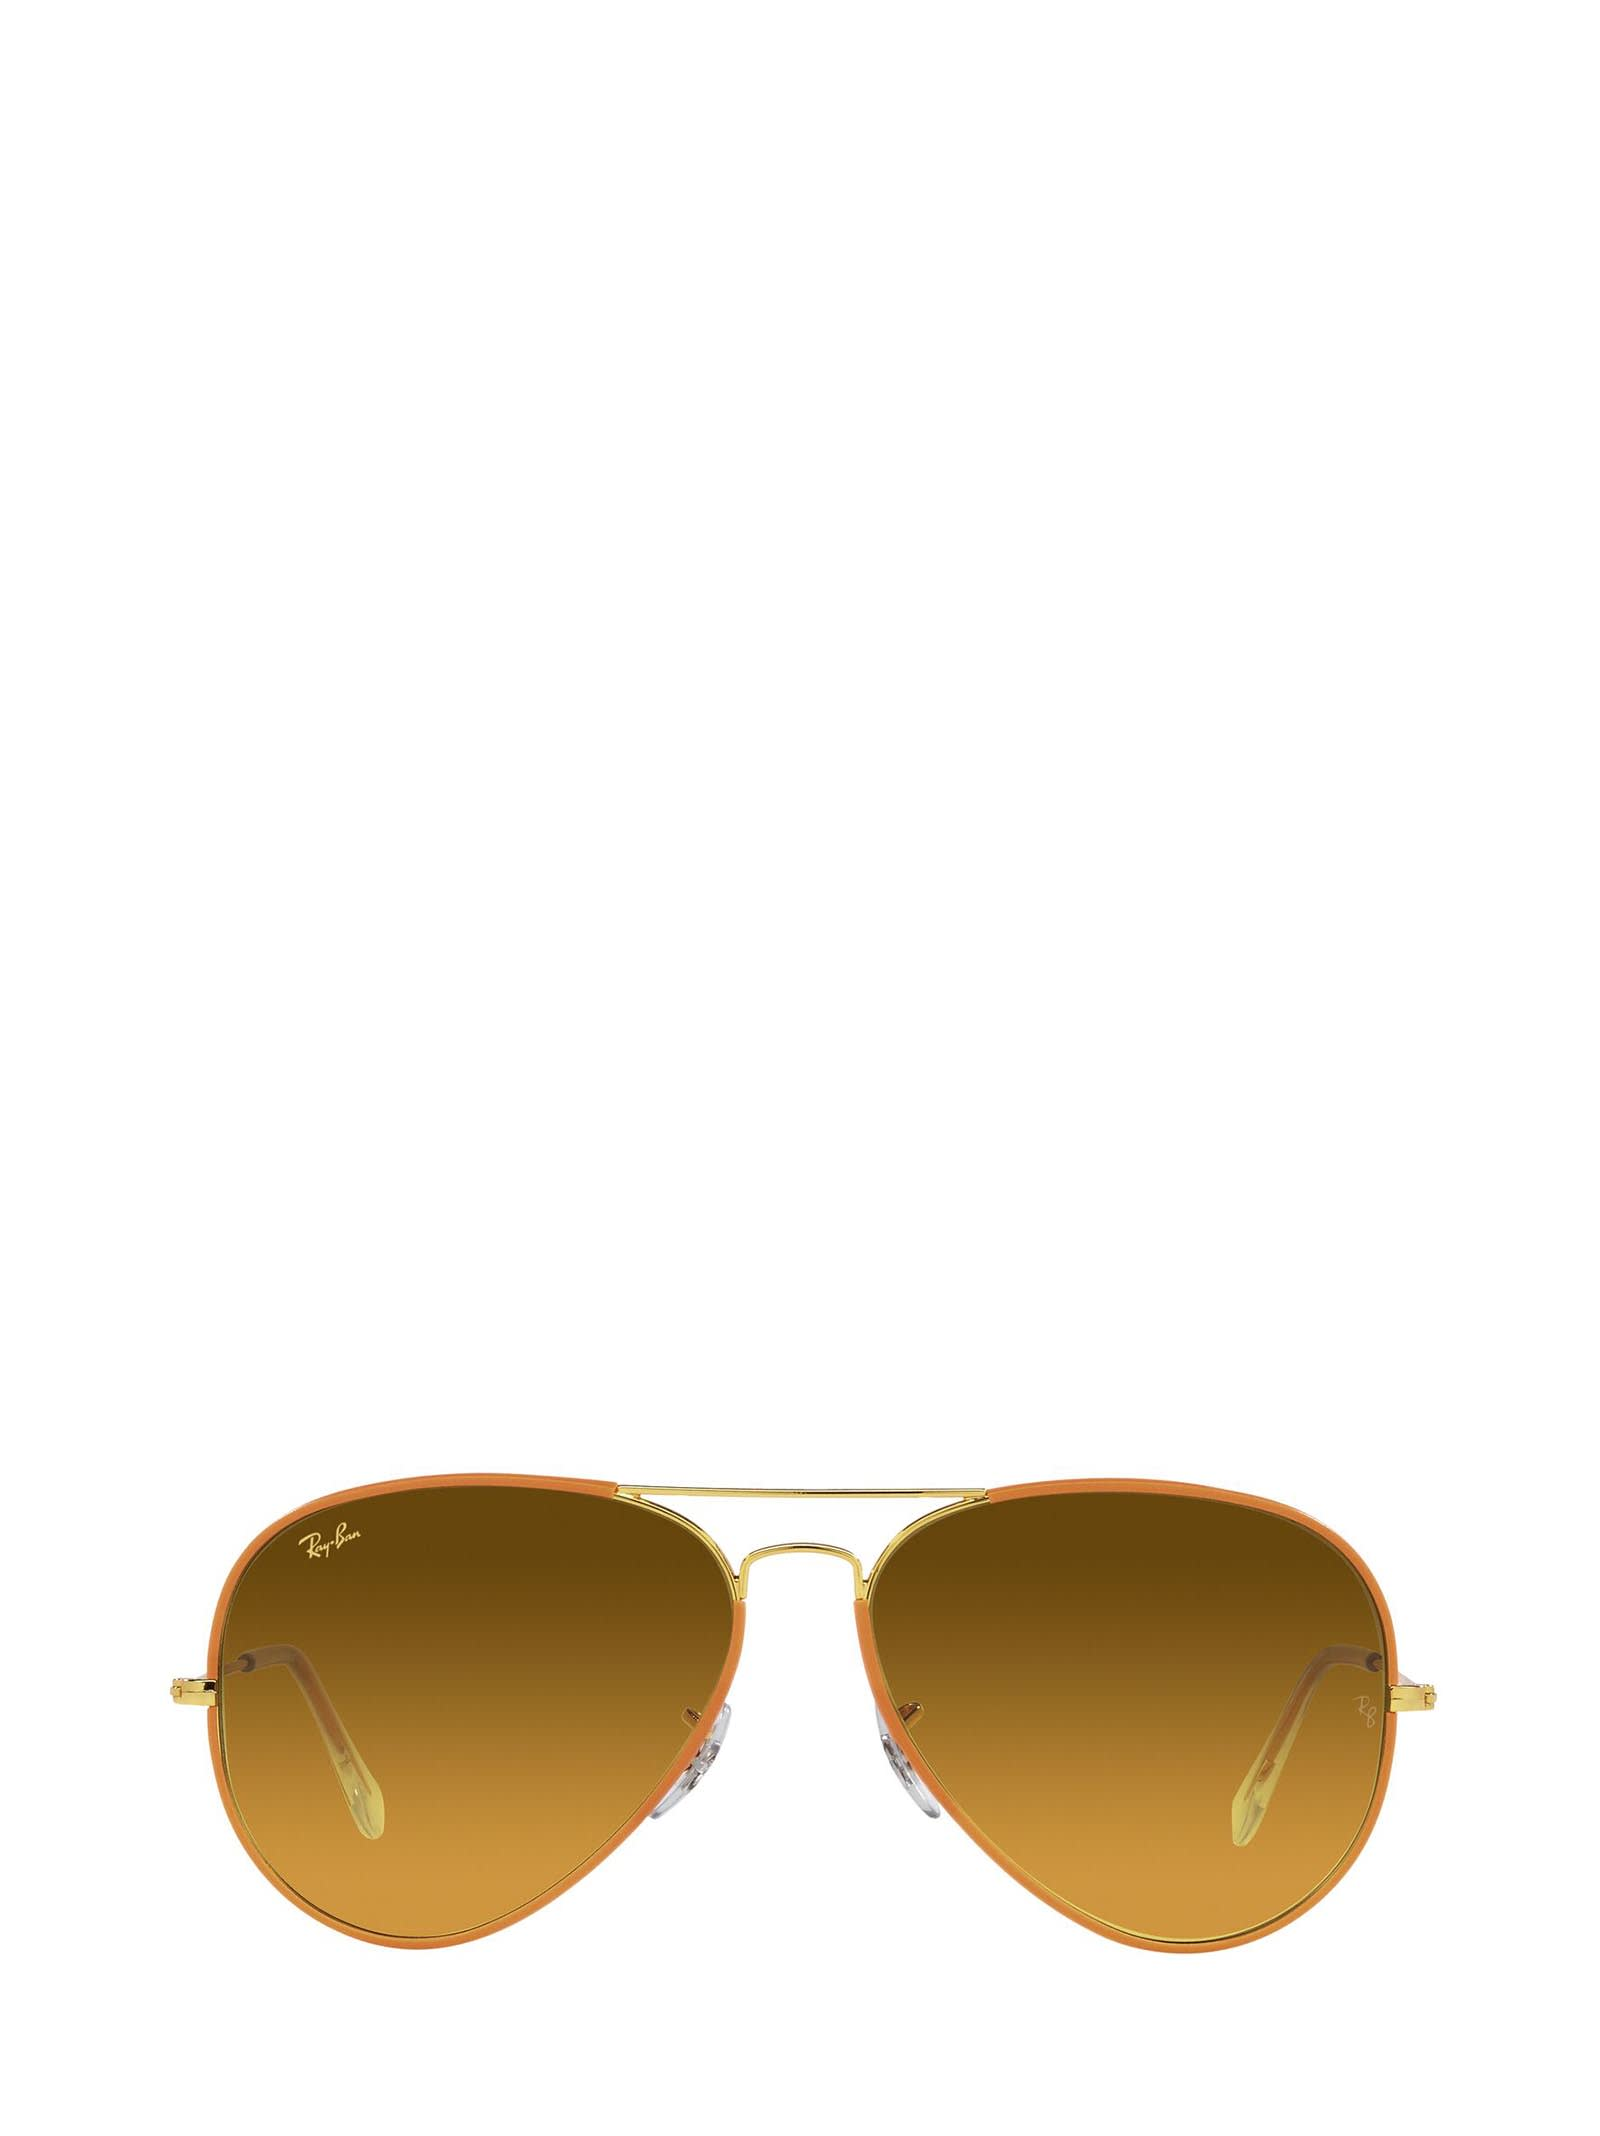 Ray-Ban Ray-ban Rb3025jm Orange On Legend Gold Sunglasses